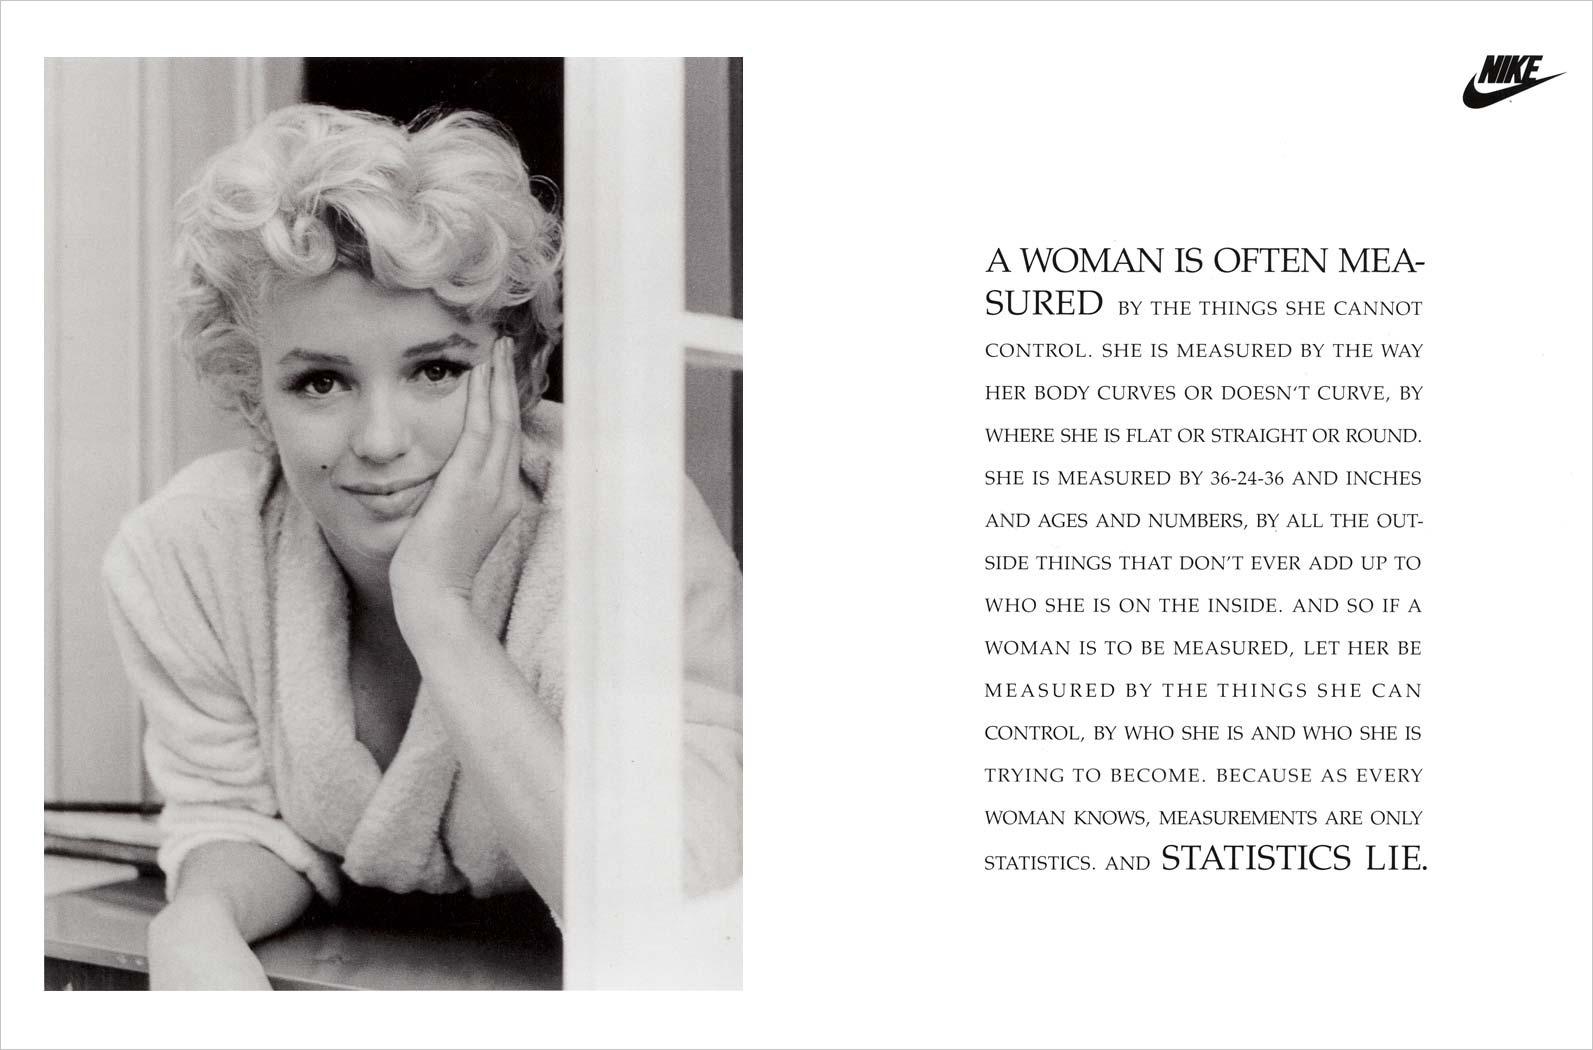 marilyn monroe Nike print ad